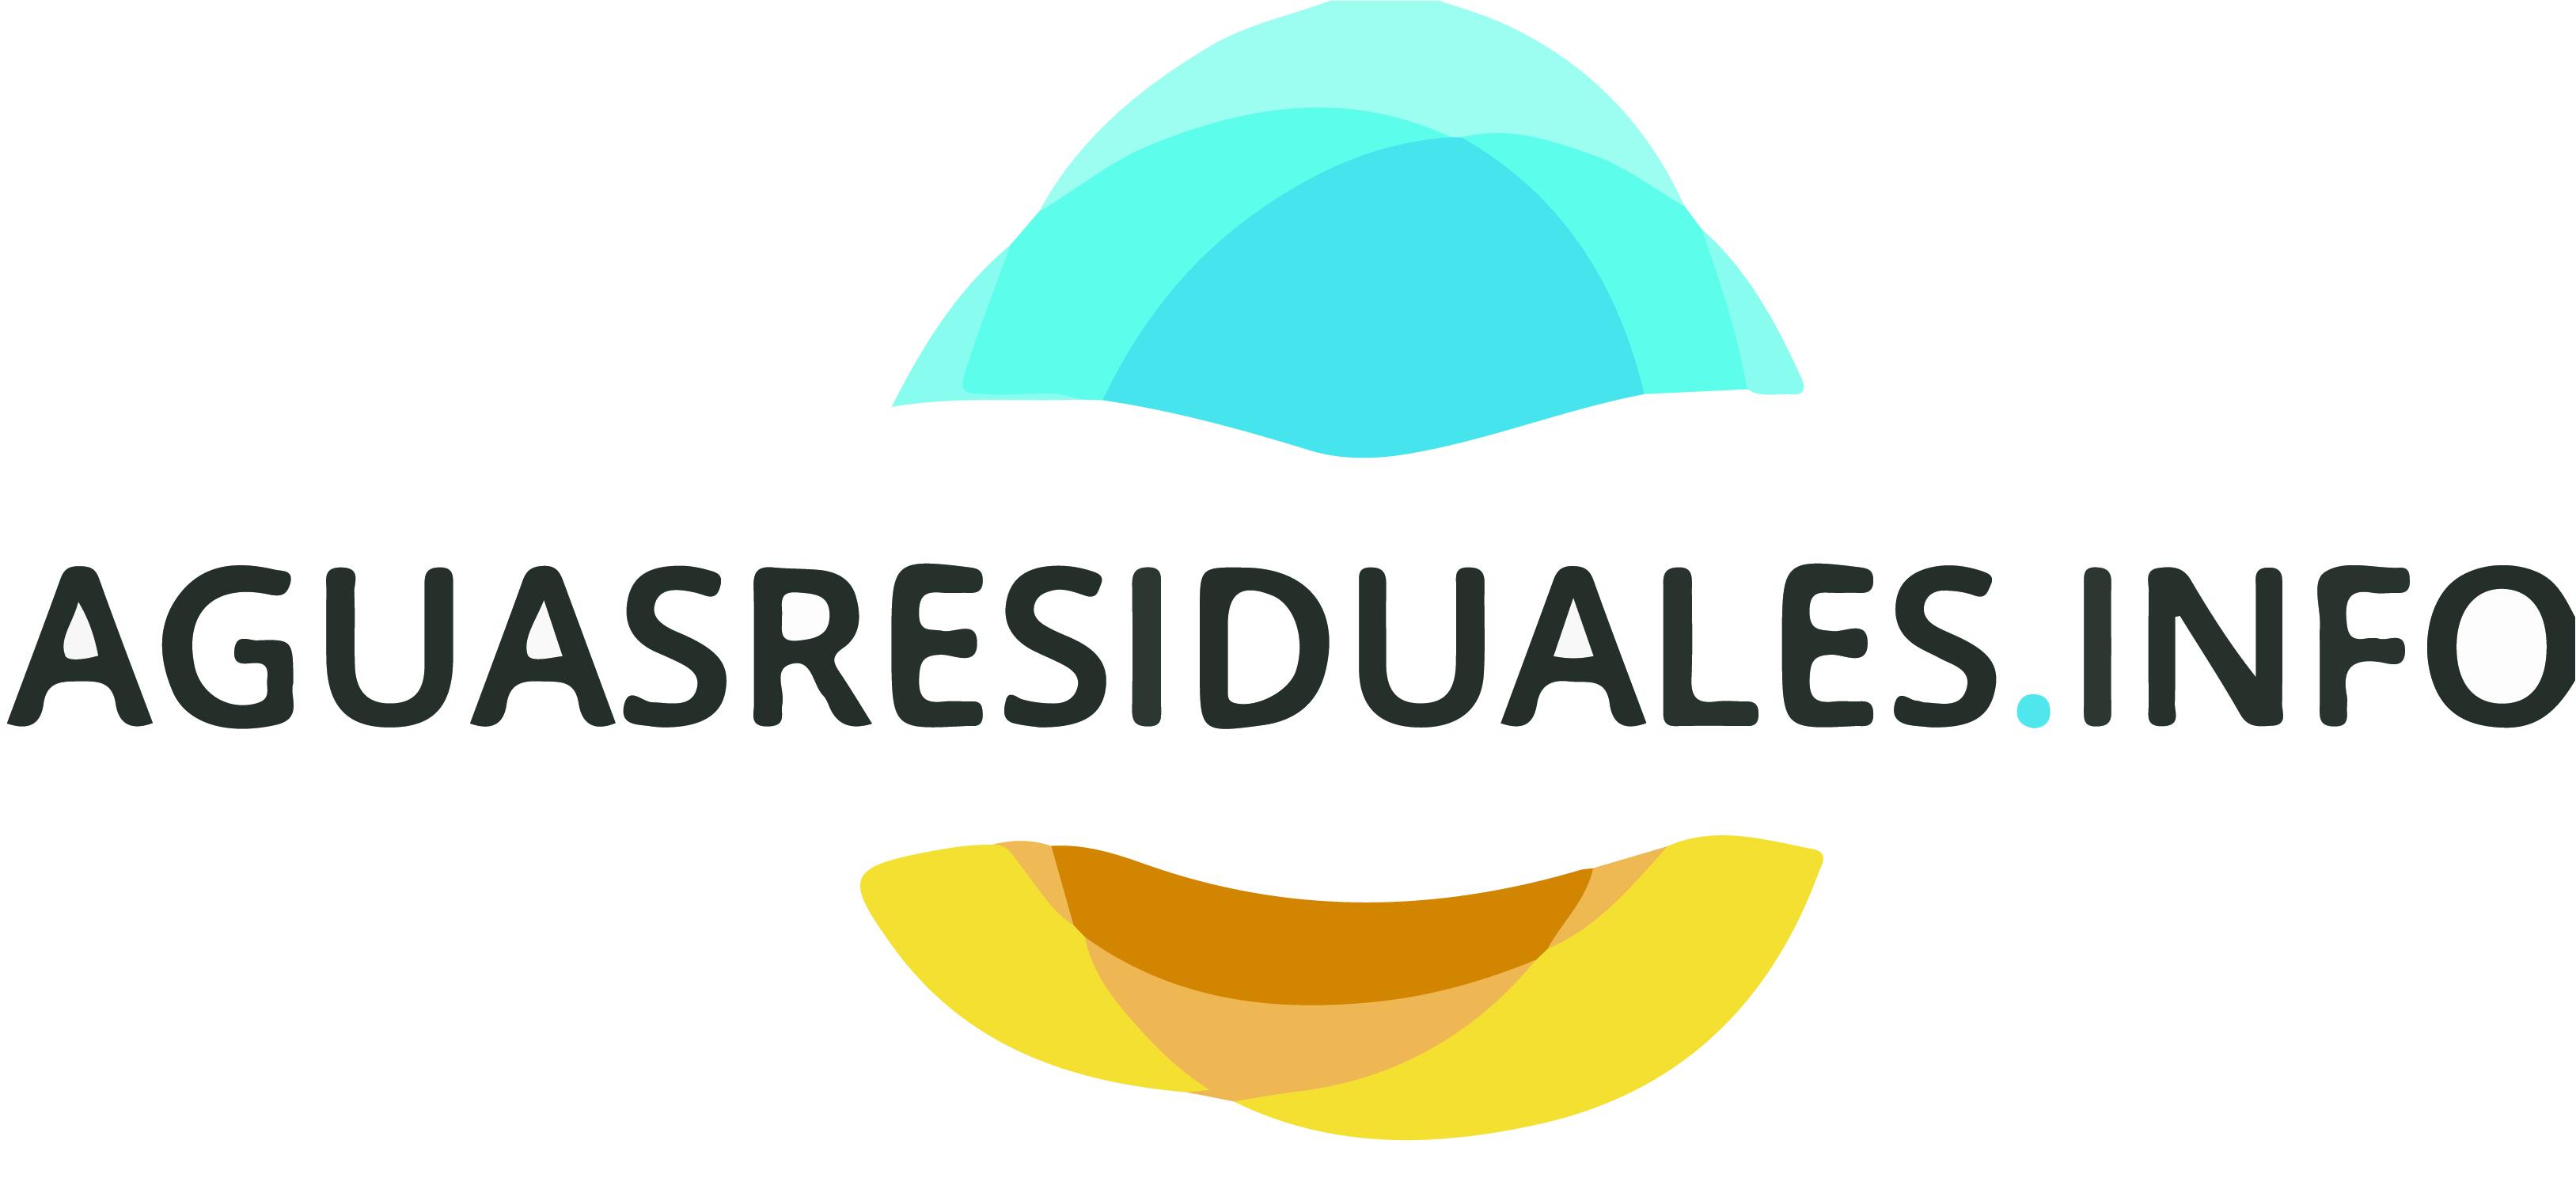 aguasresiduales.info